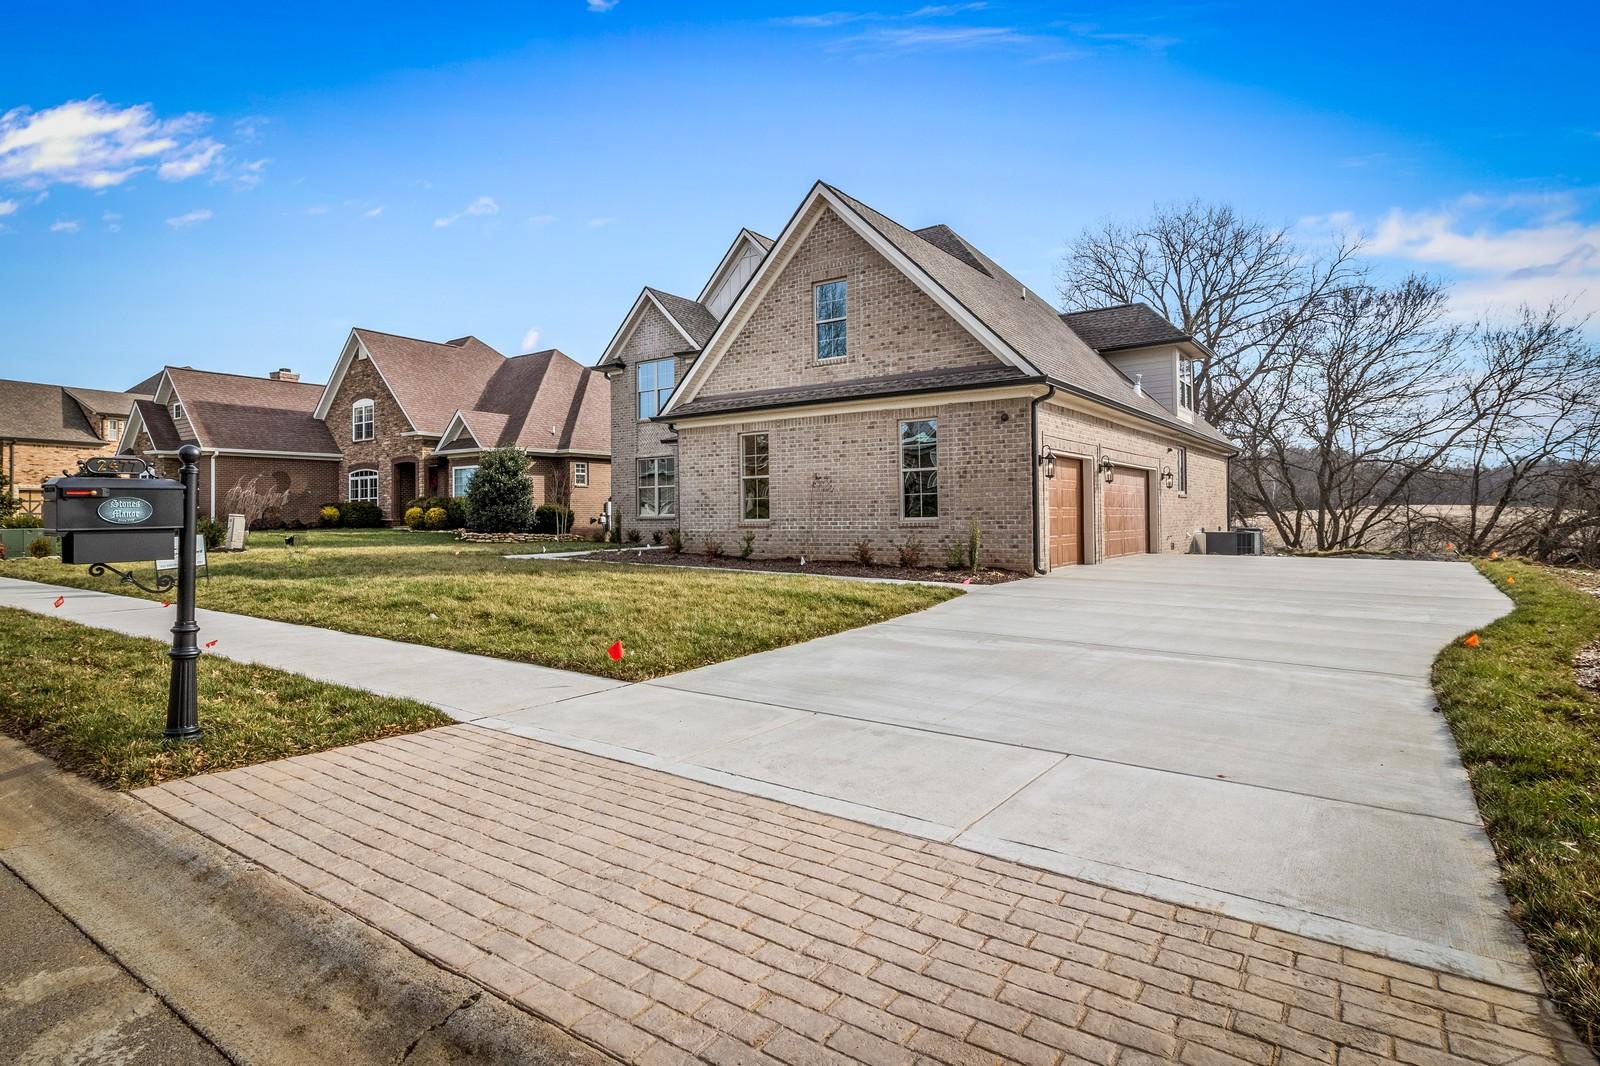 2477 Settlers Trace, Clarksville, TN 37043 - Clarksville, TN real estate listing